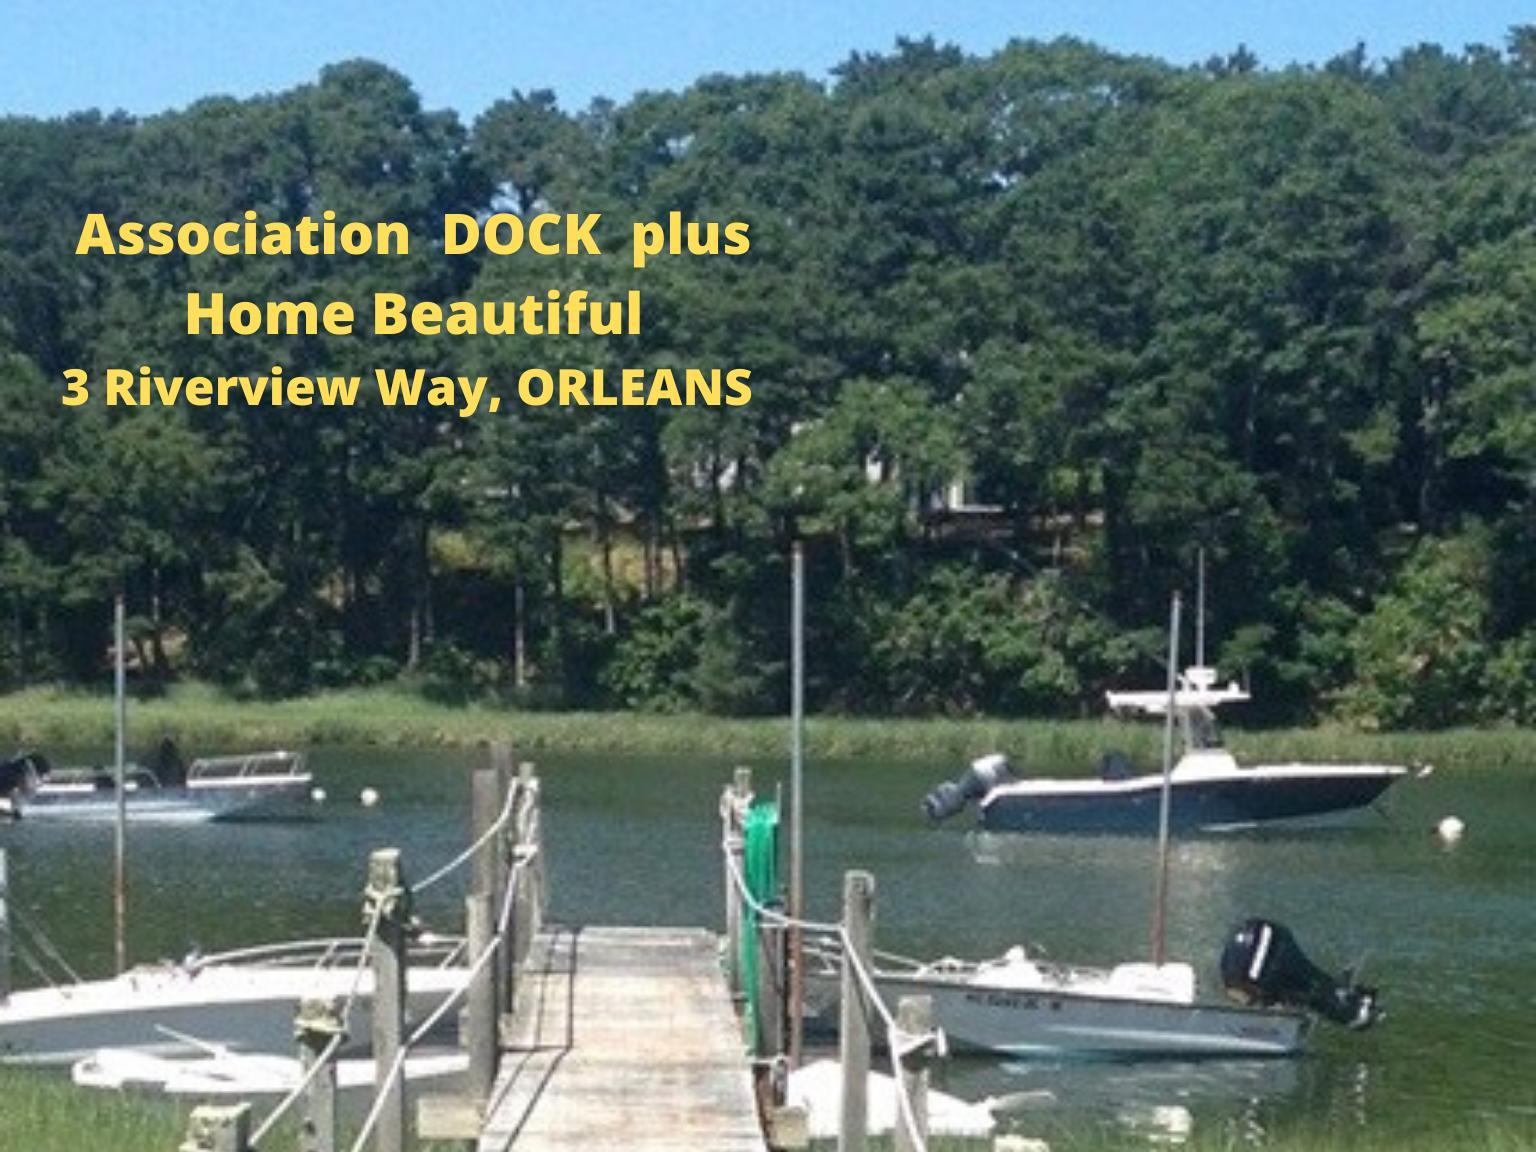 3 Riverview Drive, Orleans MA, 02653